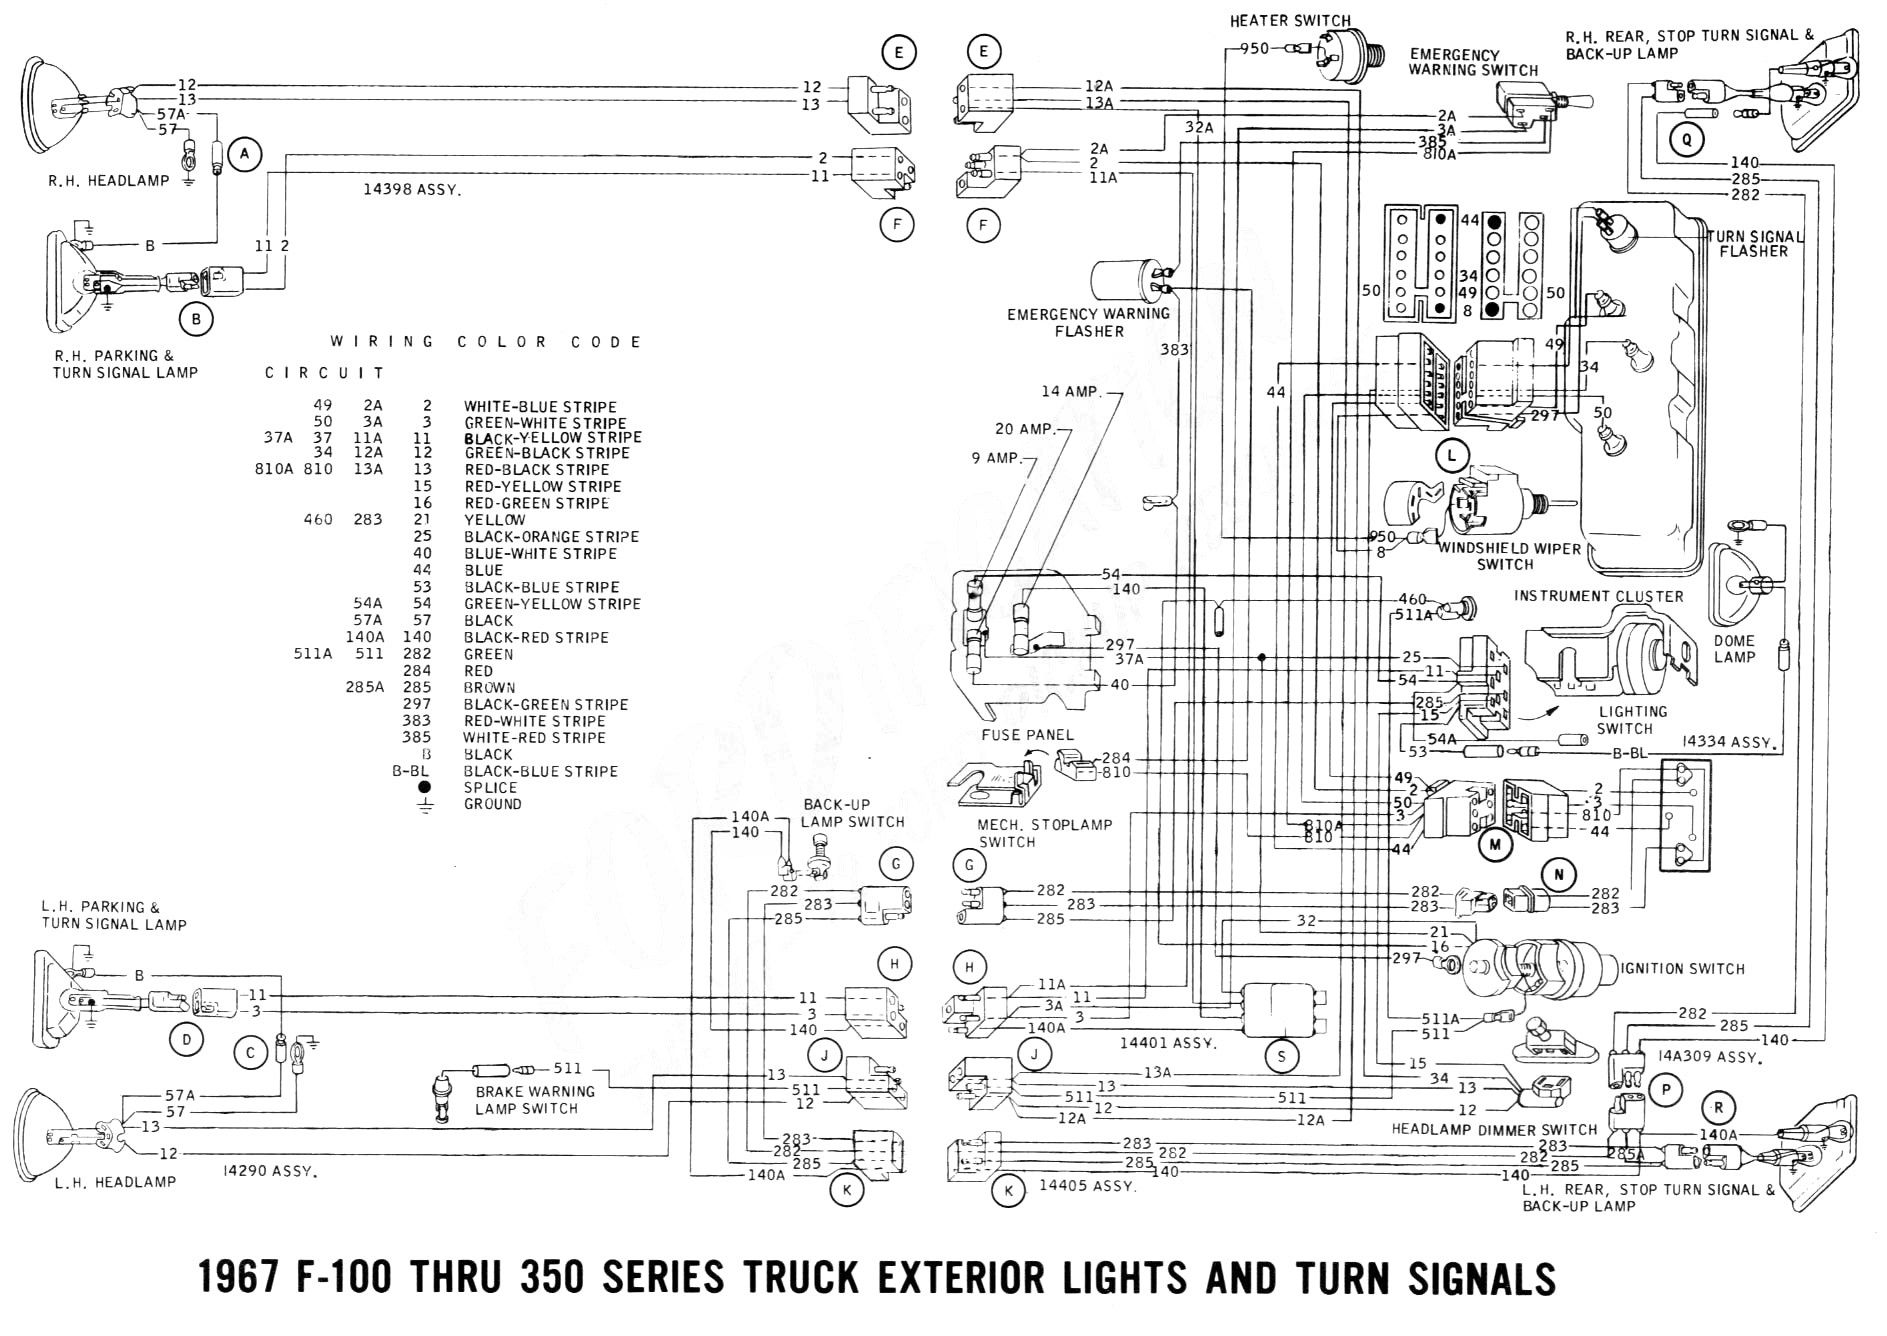 Ford F650 Wiring Diagram In 2020 Diagram Design Jeep Grand Cherokee Diagram